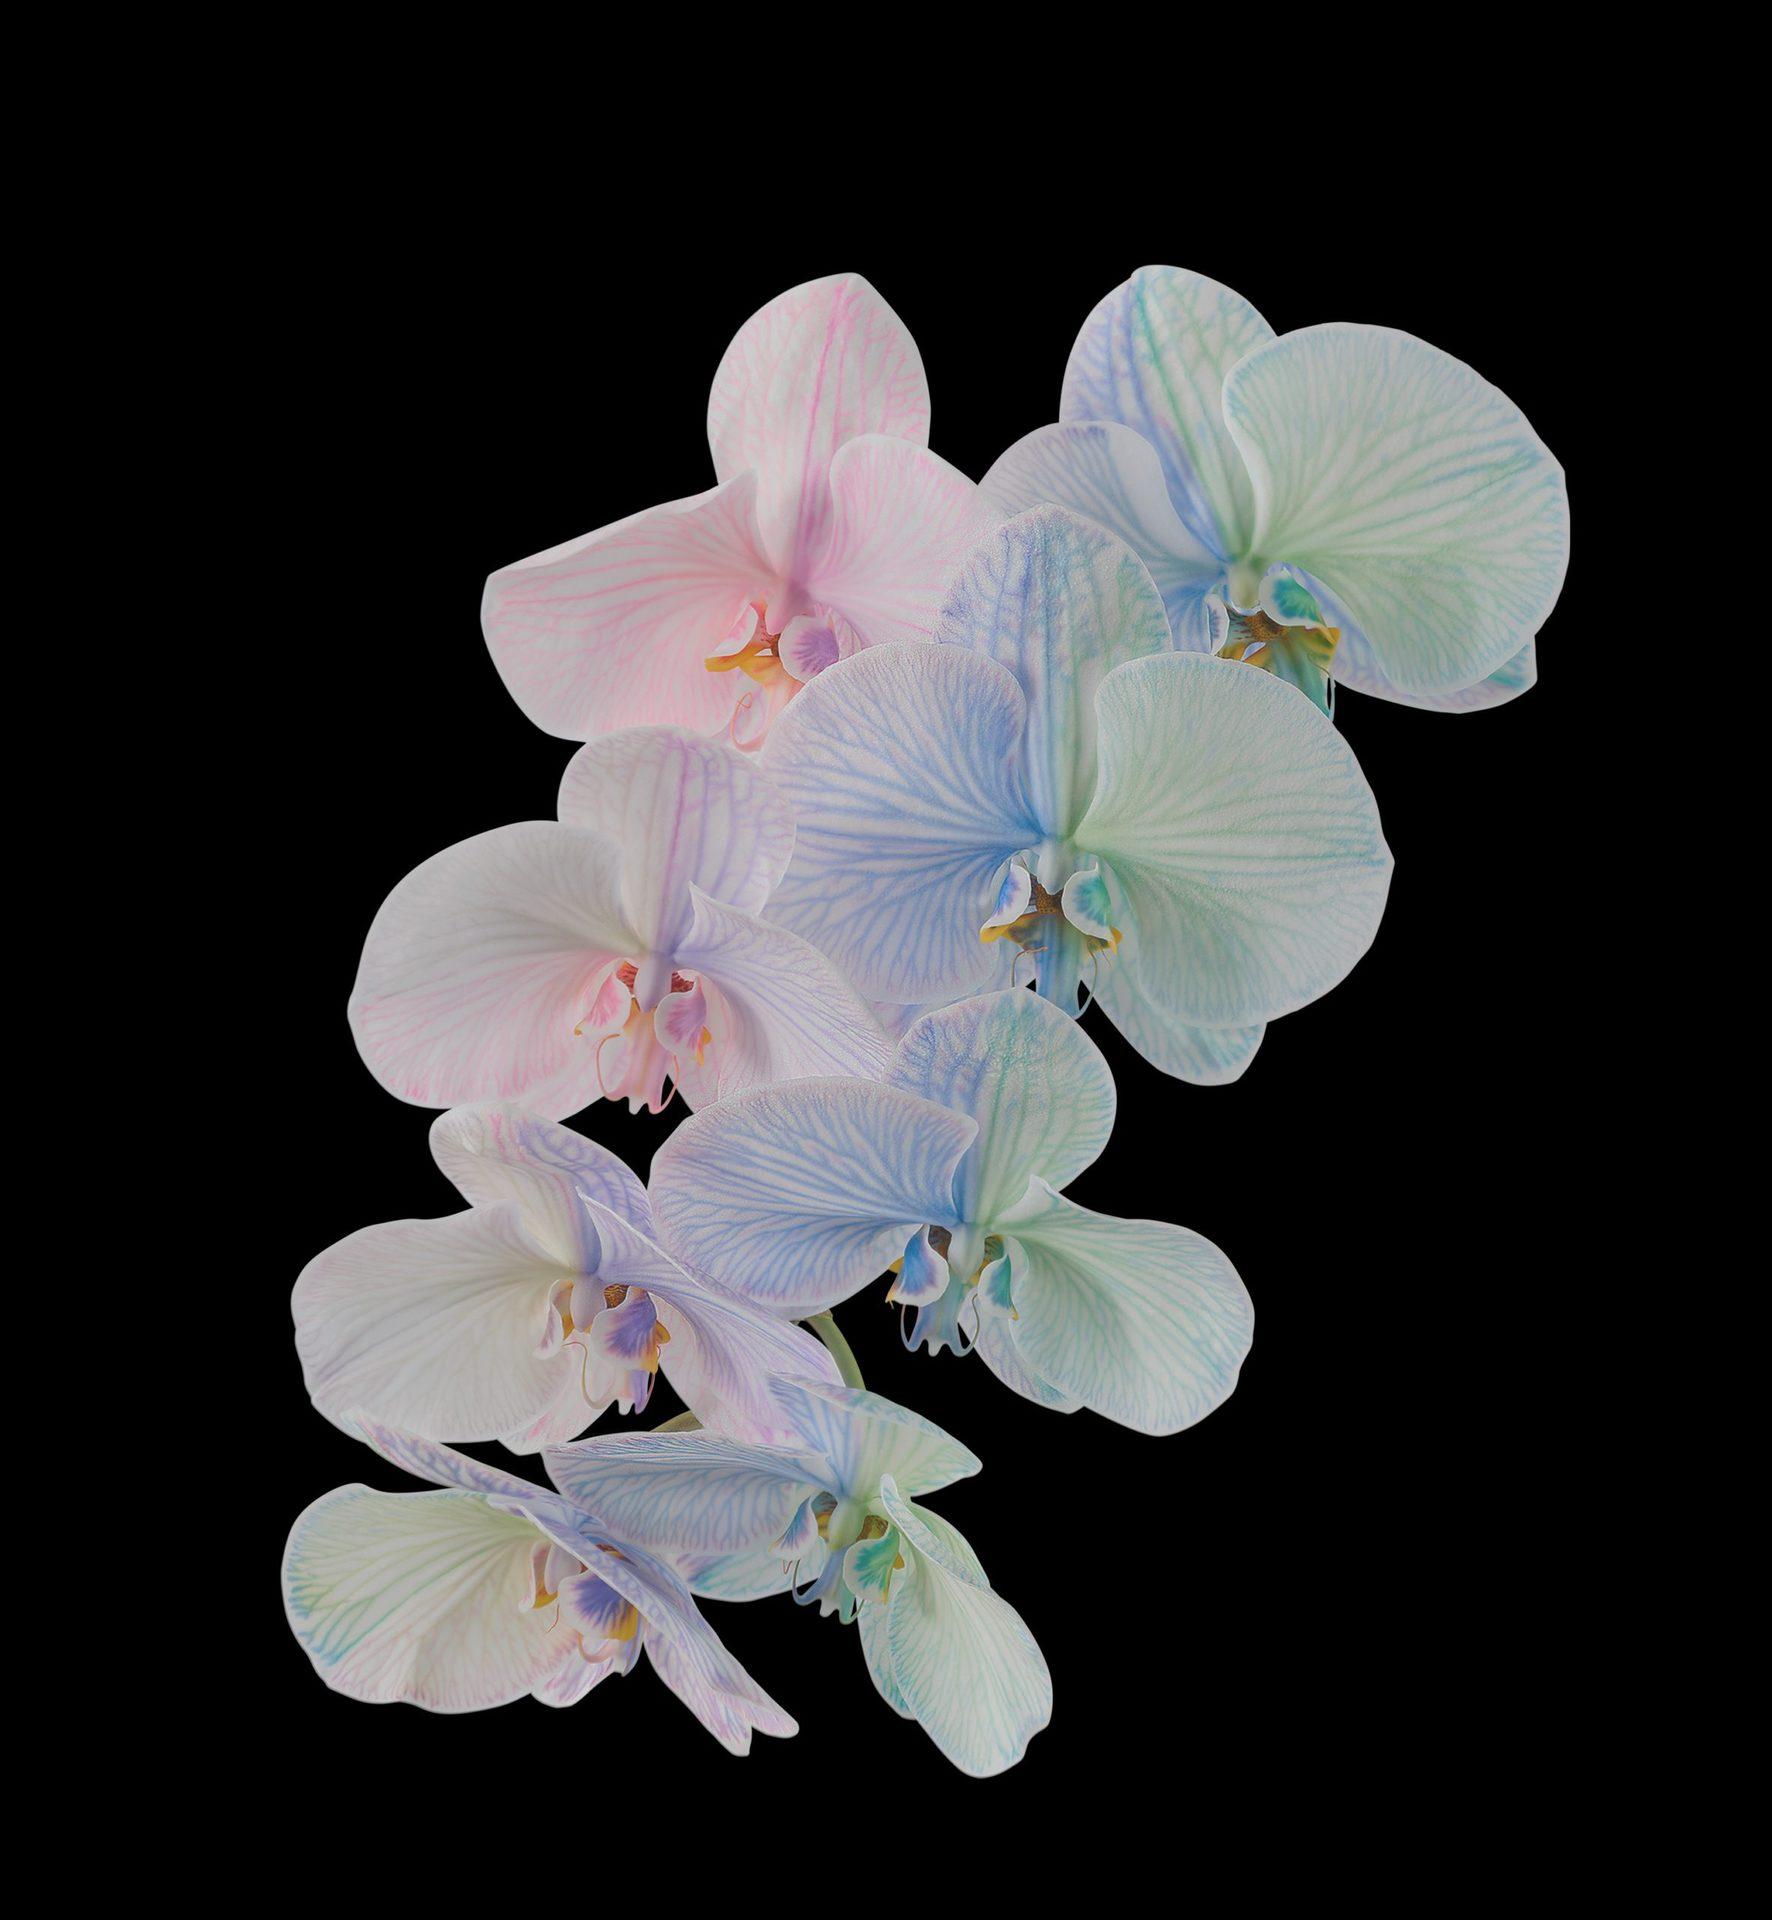 Pixel 6 Pro Wallpaper Moth Orchid dark by Andrew Zuckerman